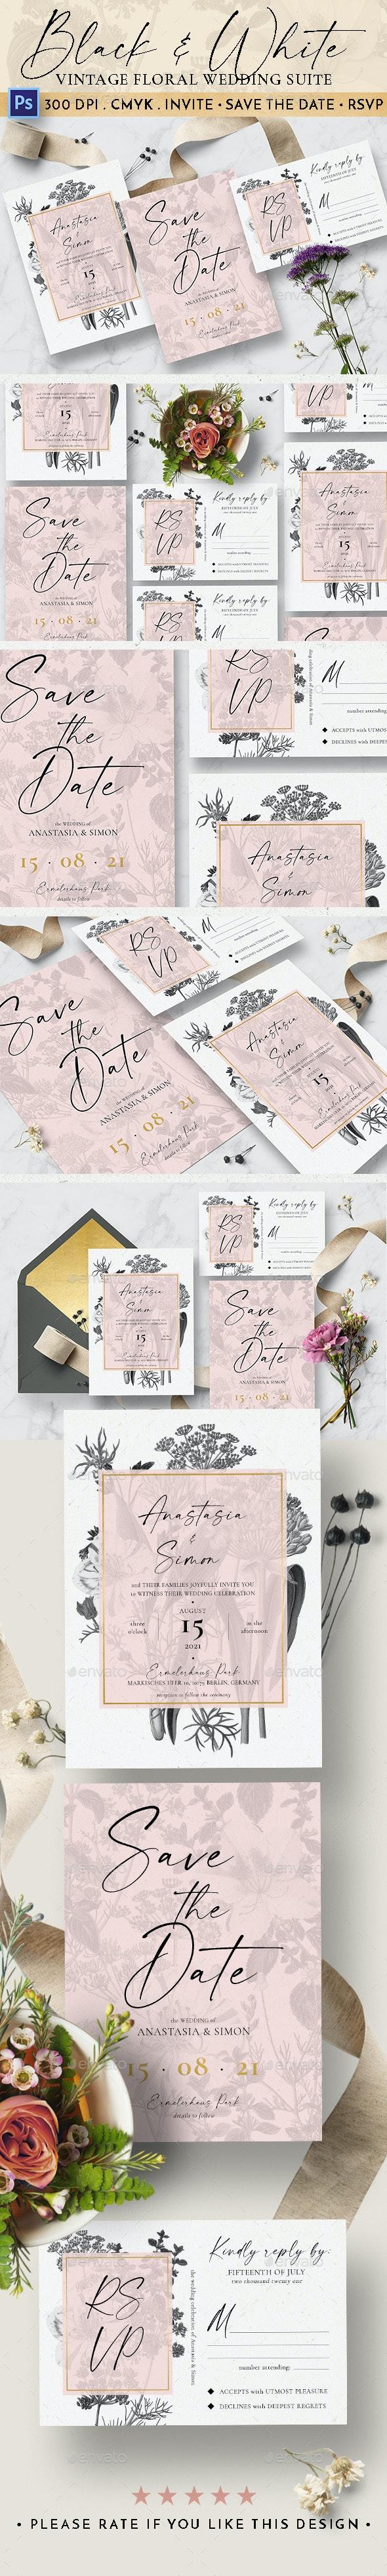 Black & White Vintage Floral Wedding Suite - Weddings Cards & Invites